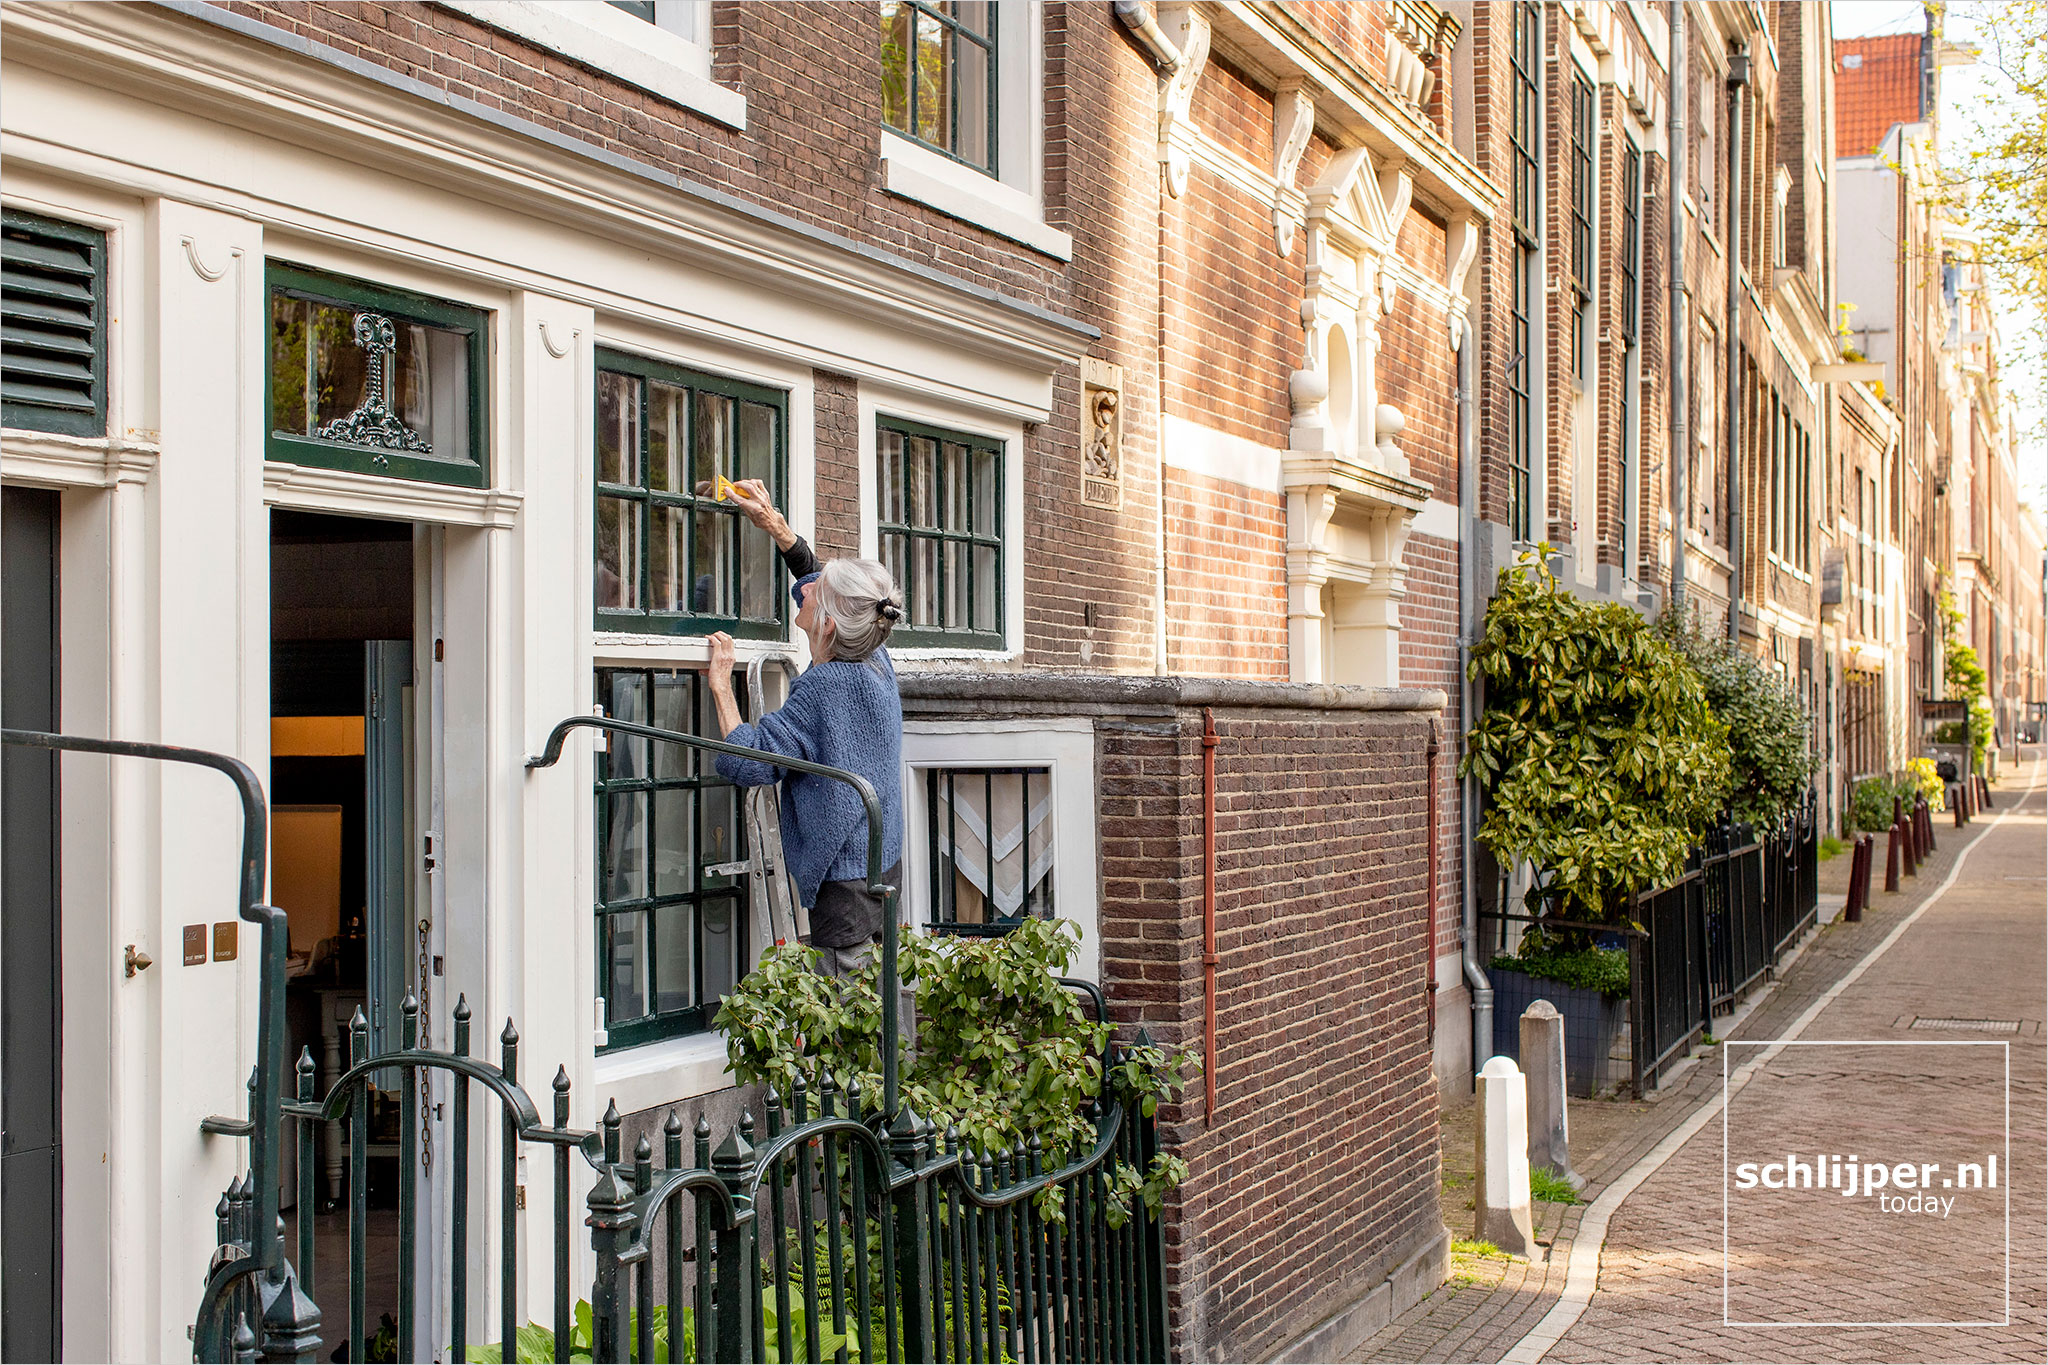 The Netherlands, Amsterdam, 9 mei 2021